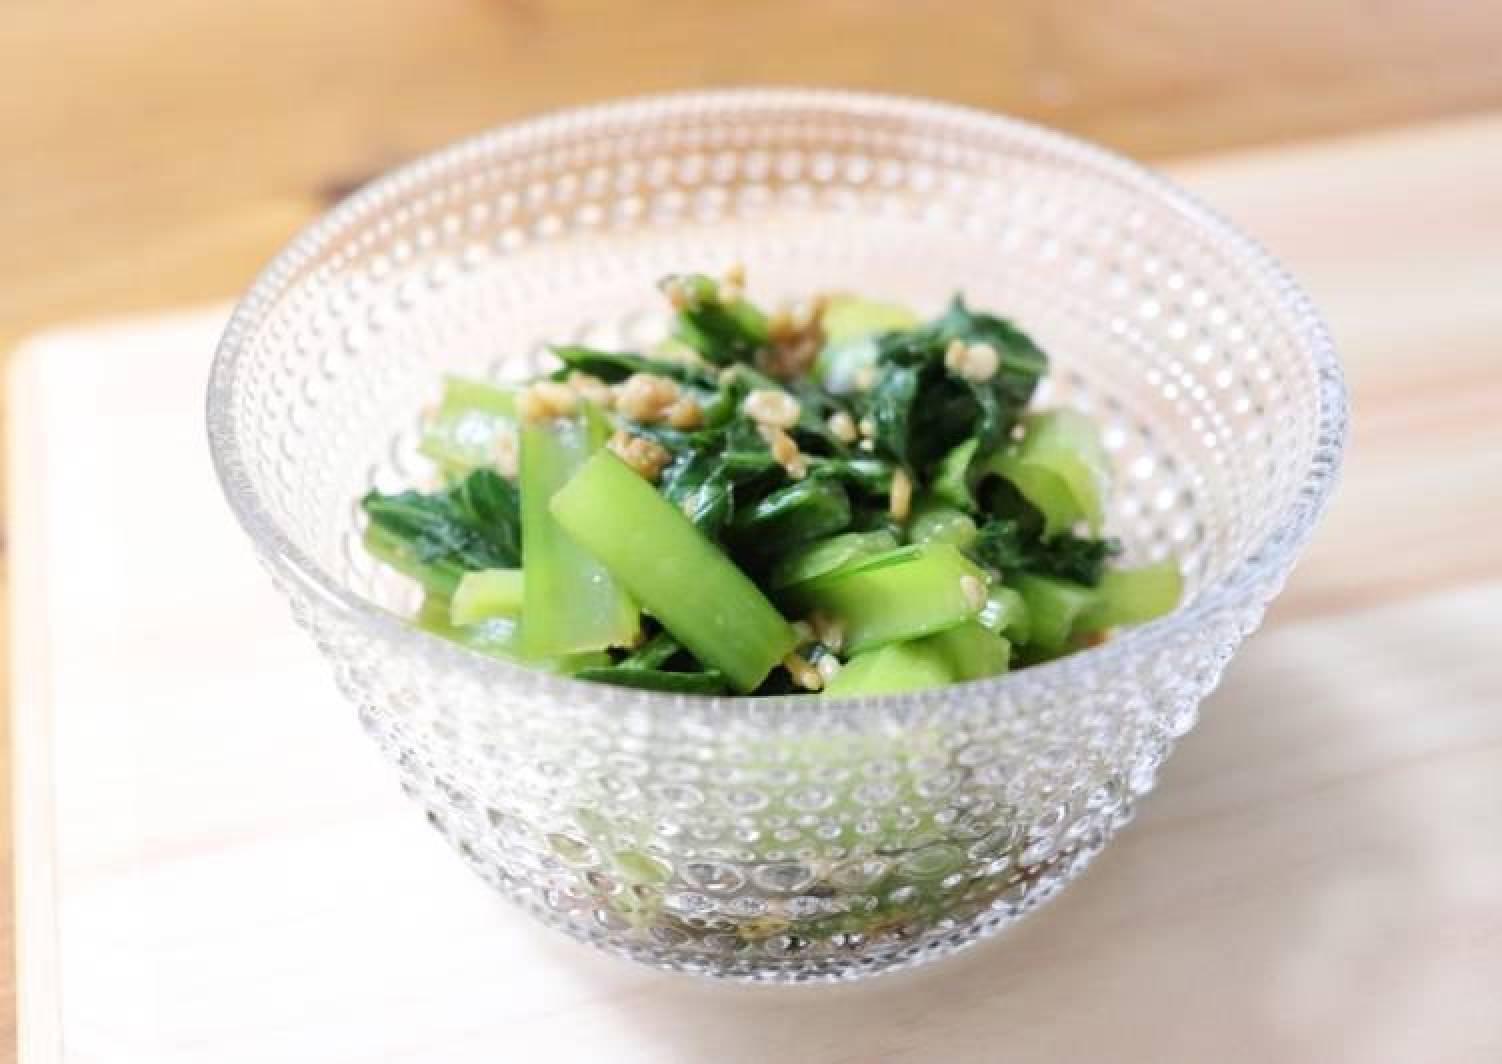 Japanese vegetable dishes, Komatsuna and Amazake, balsamic vinegar